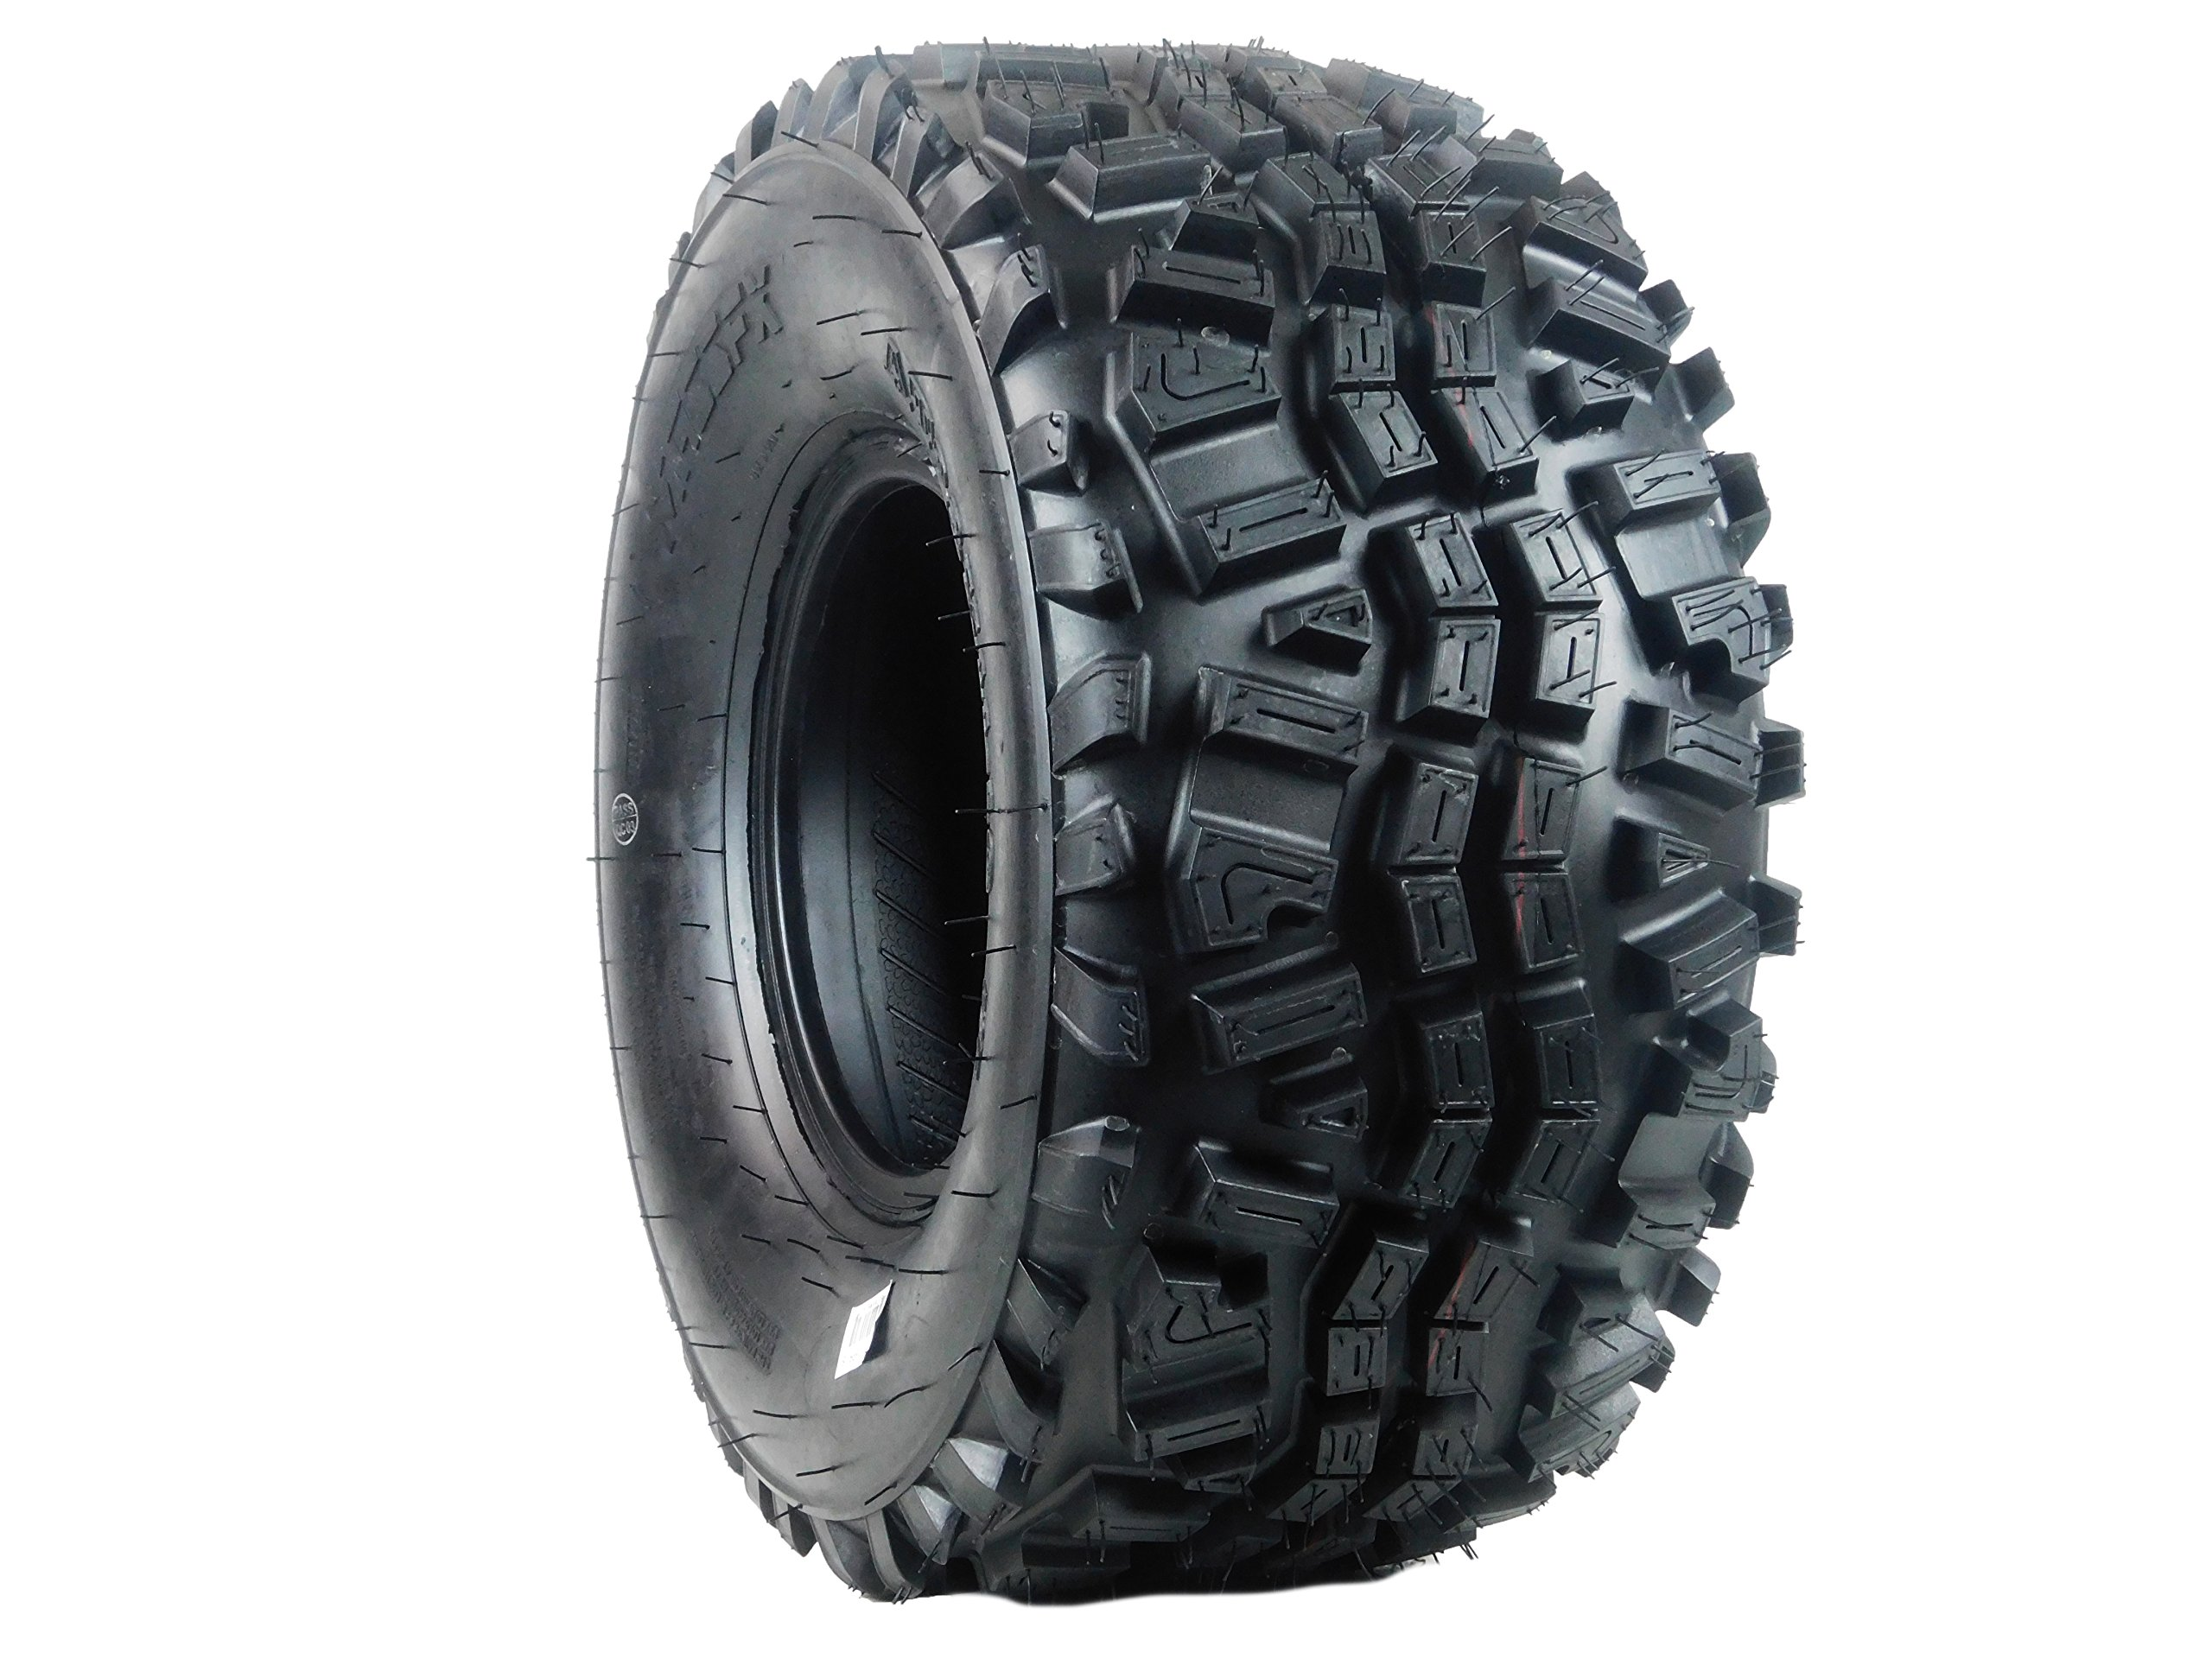 New Single MASSFX VS231110 ATV Tire 23X11X10 23x11-10 OEM Kawasaki Mule Tire 6 Ply